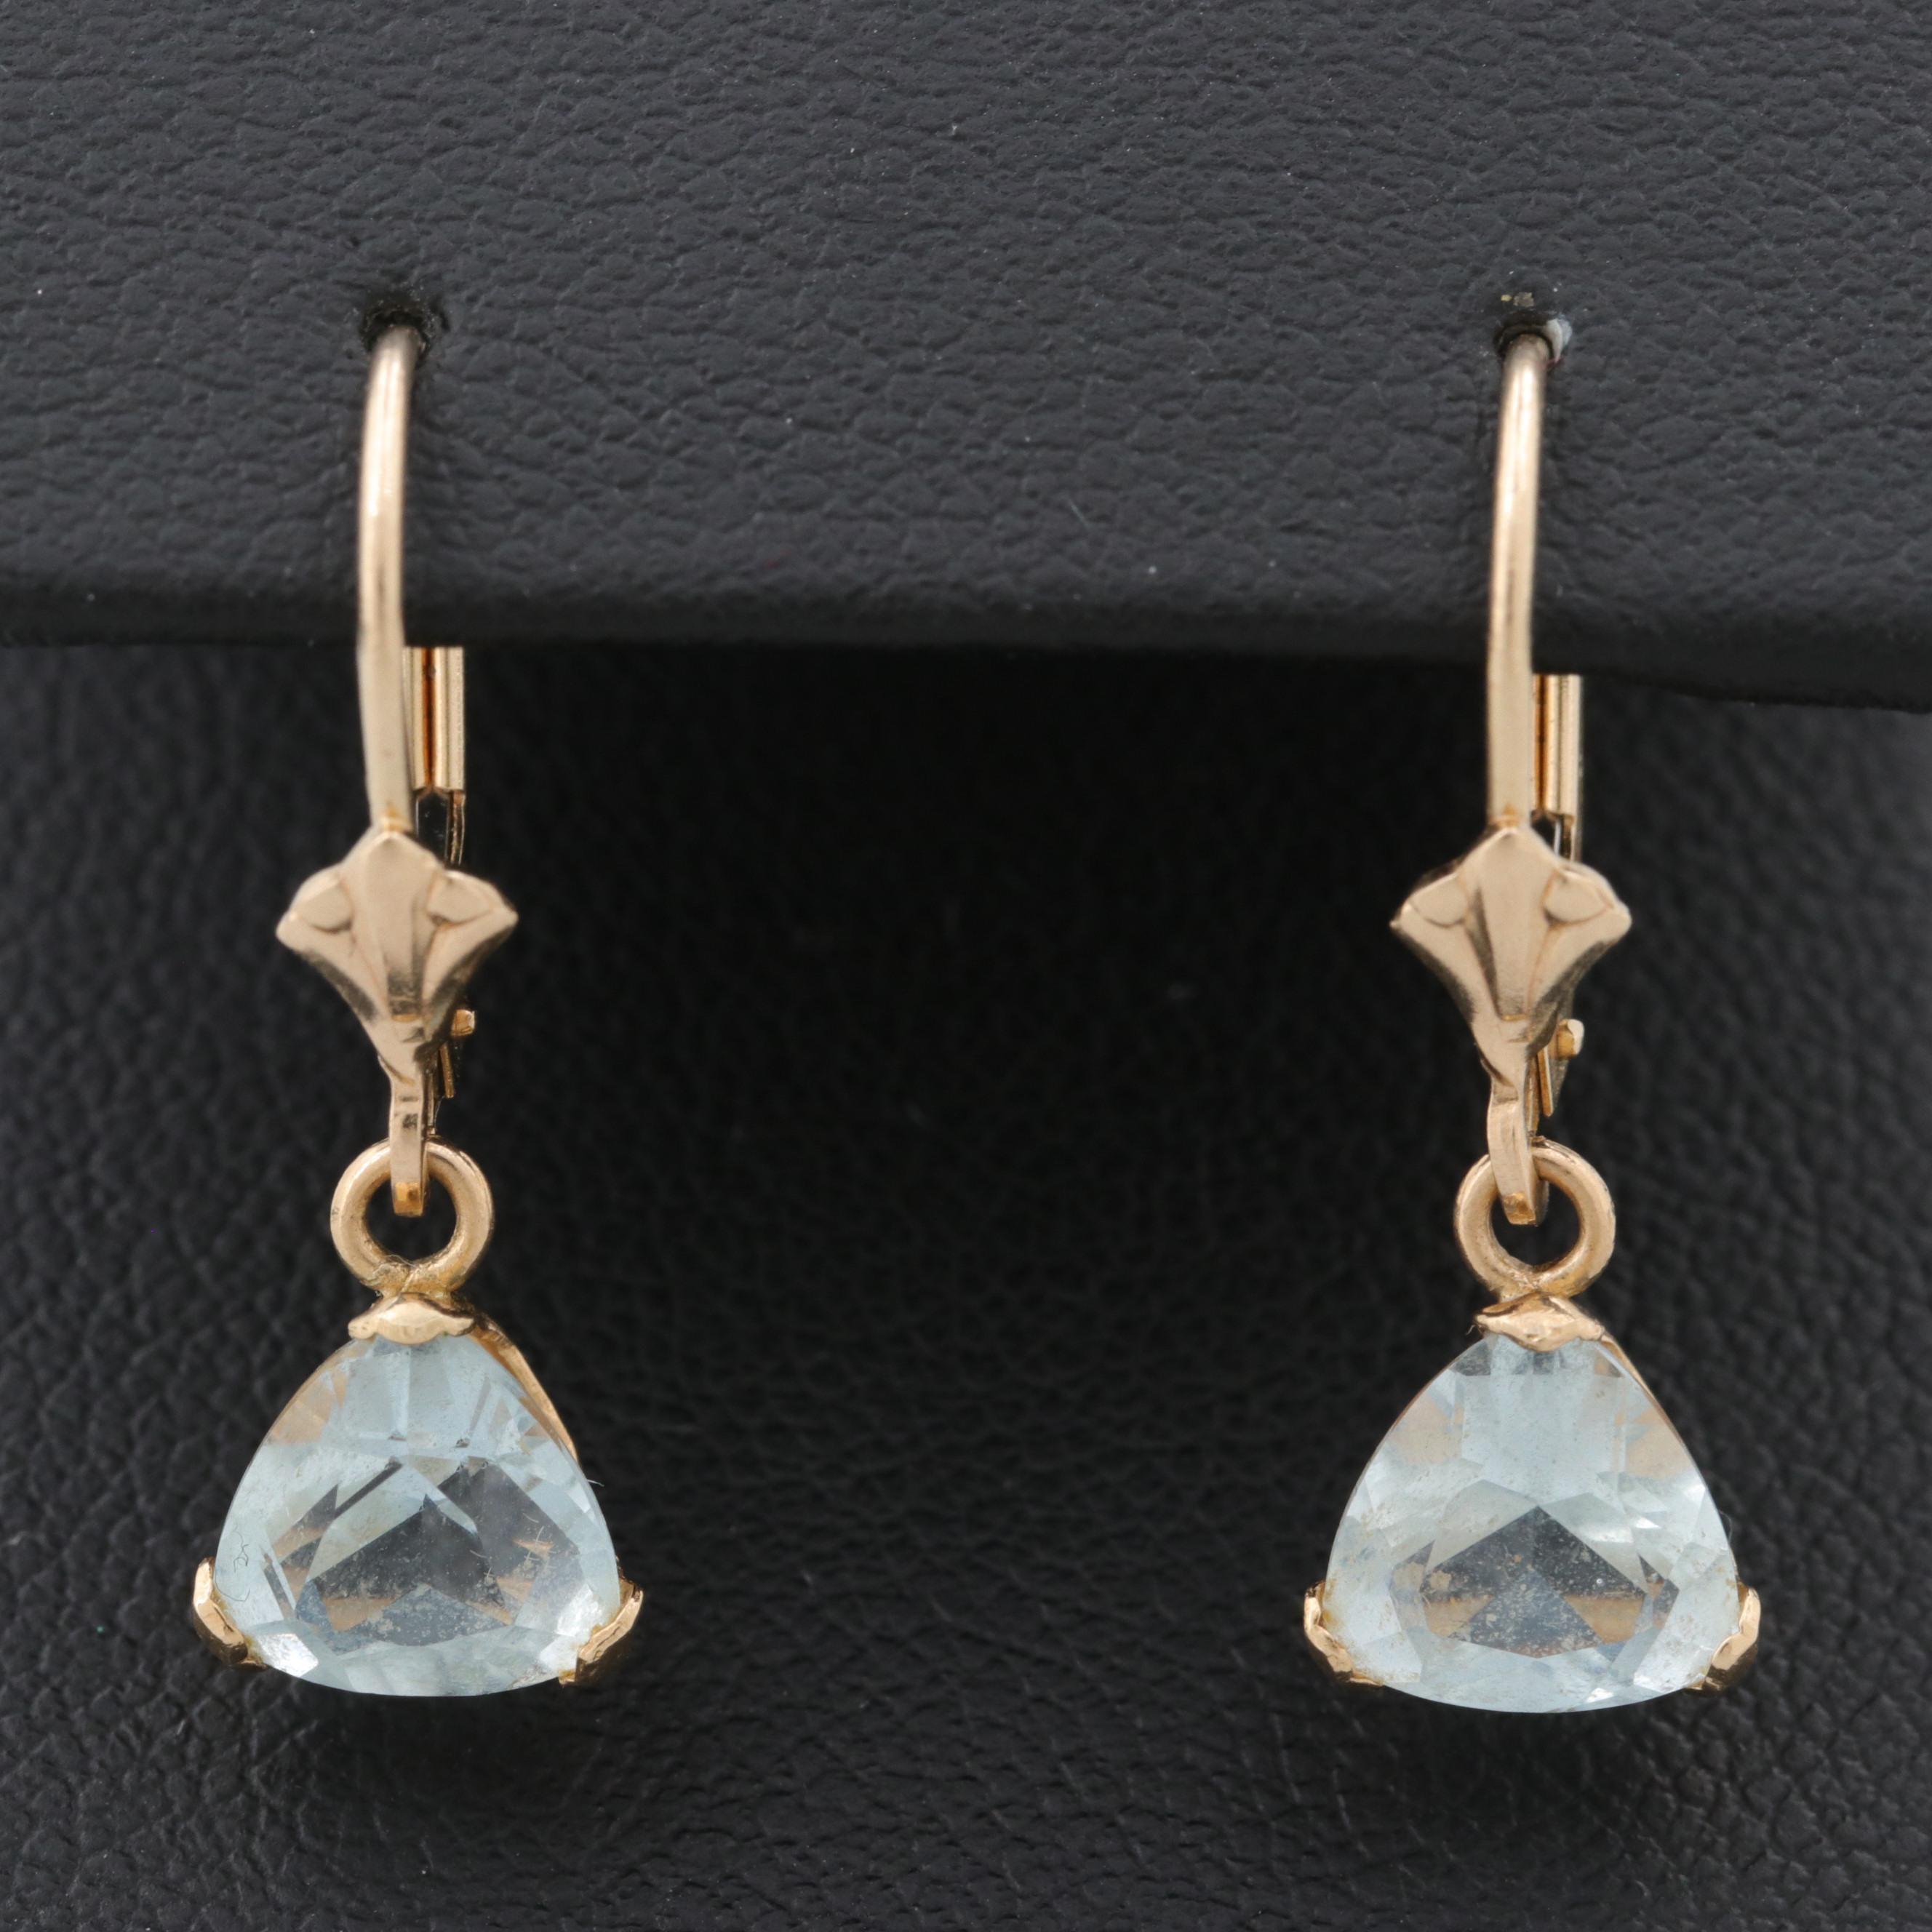 14K Yellow Gold Aquamarine Dangle Earrings